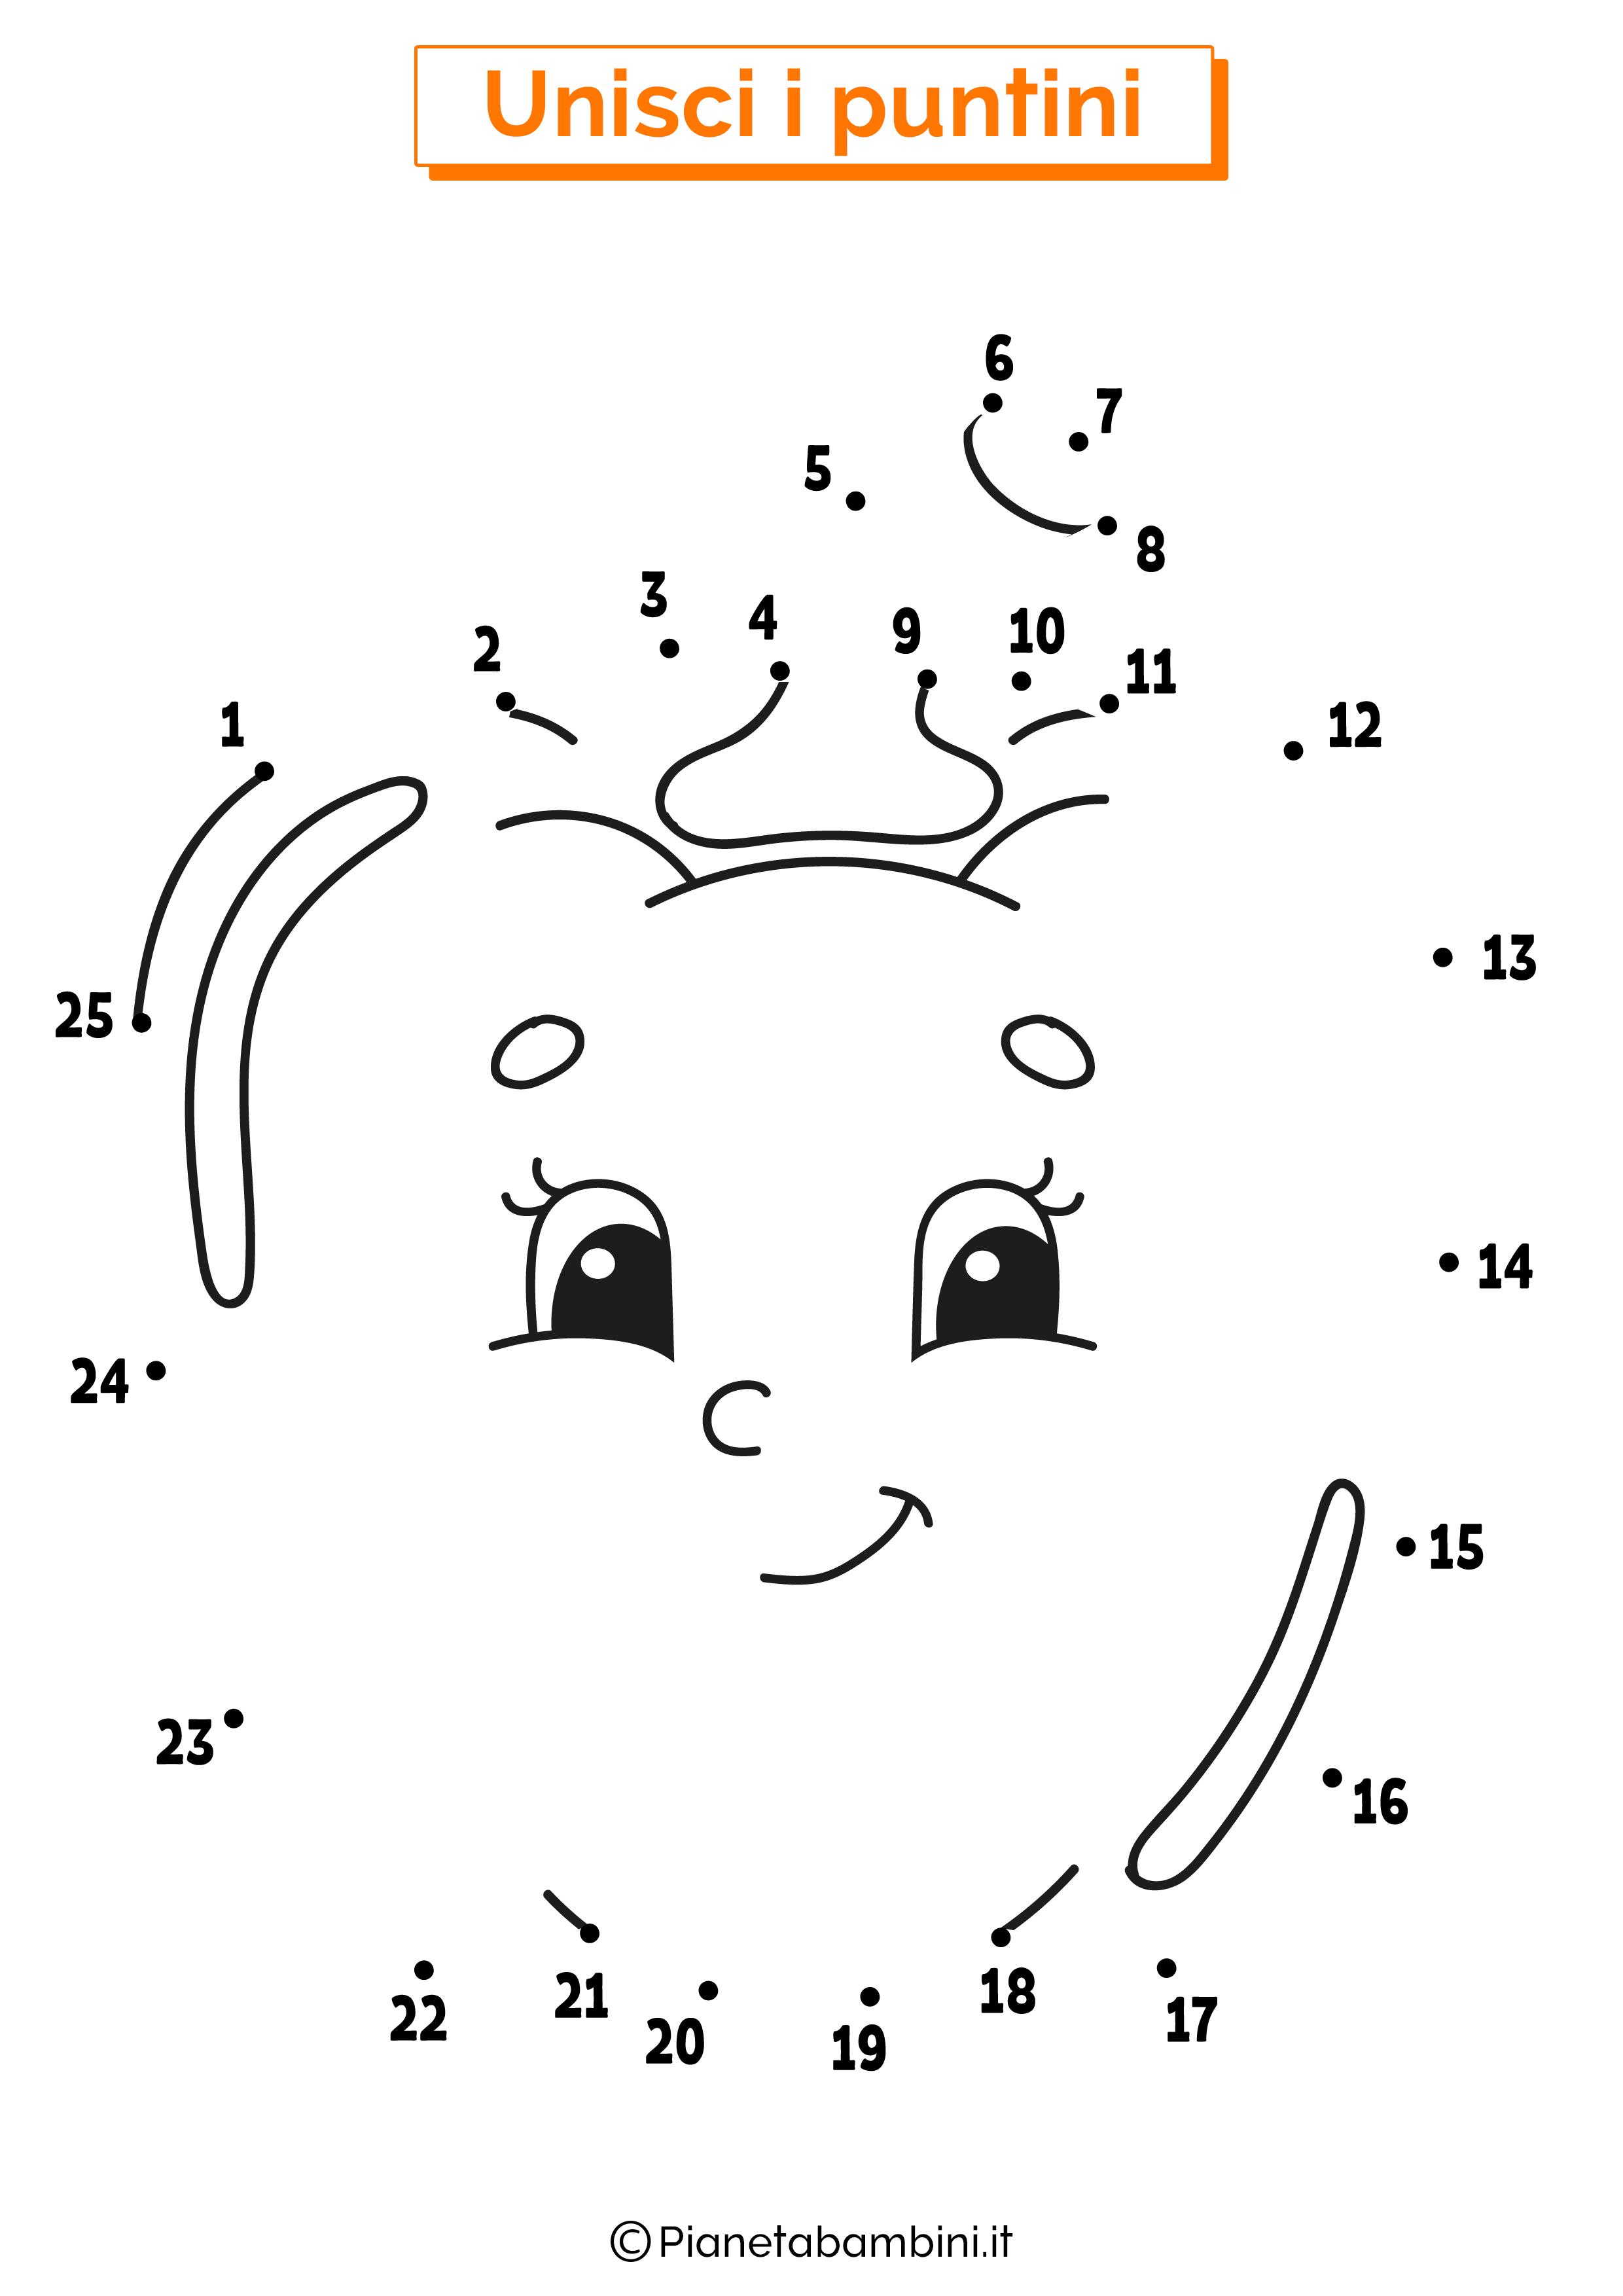 Disegno unisci i puntini peperone